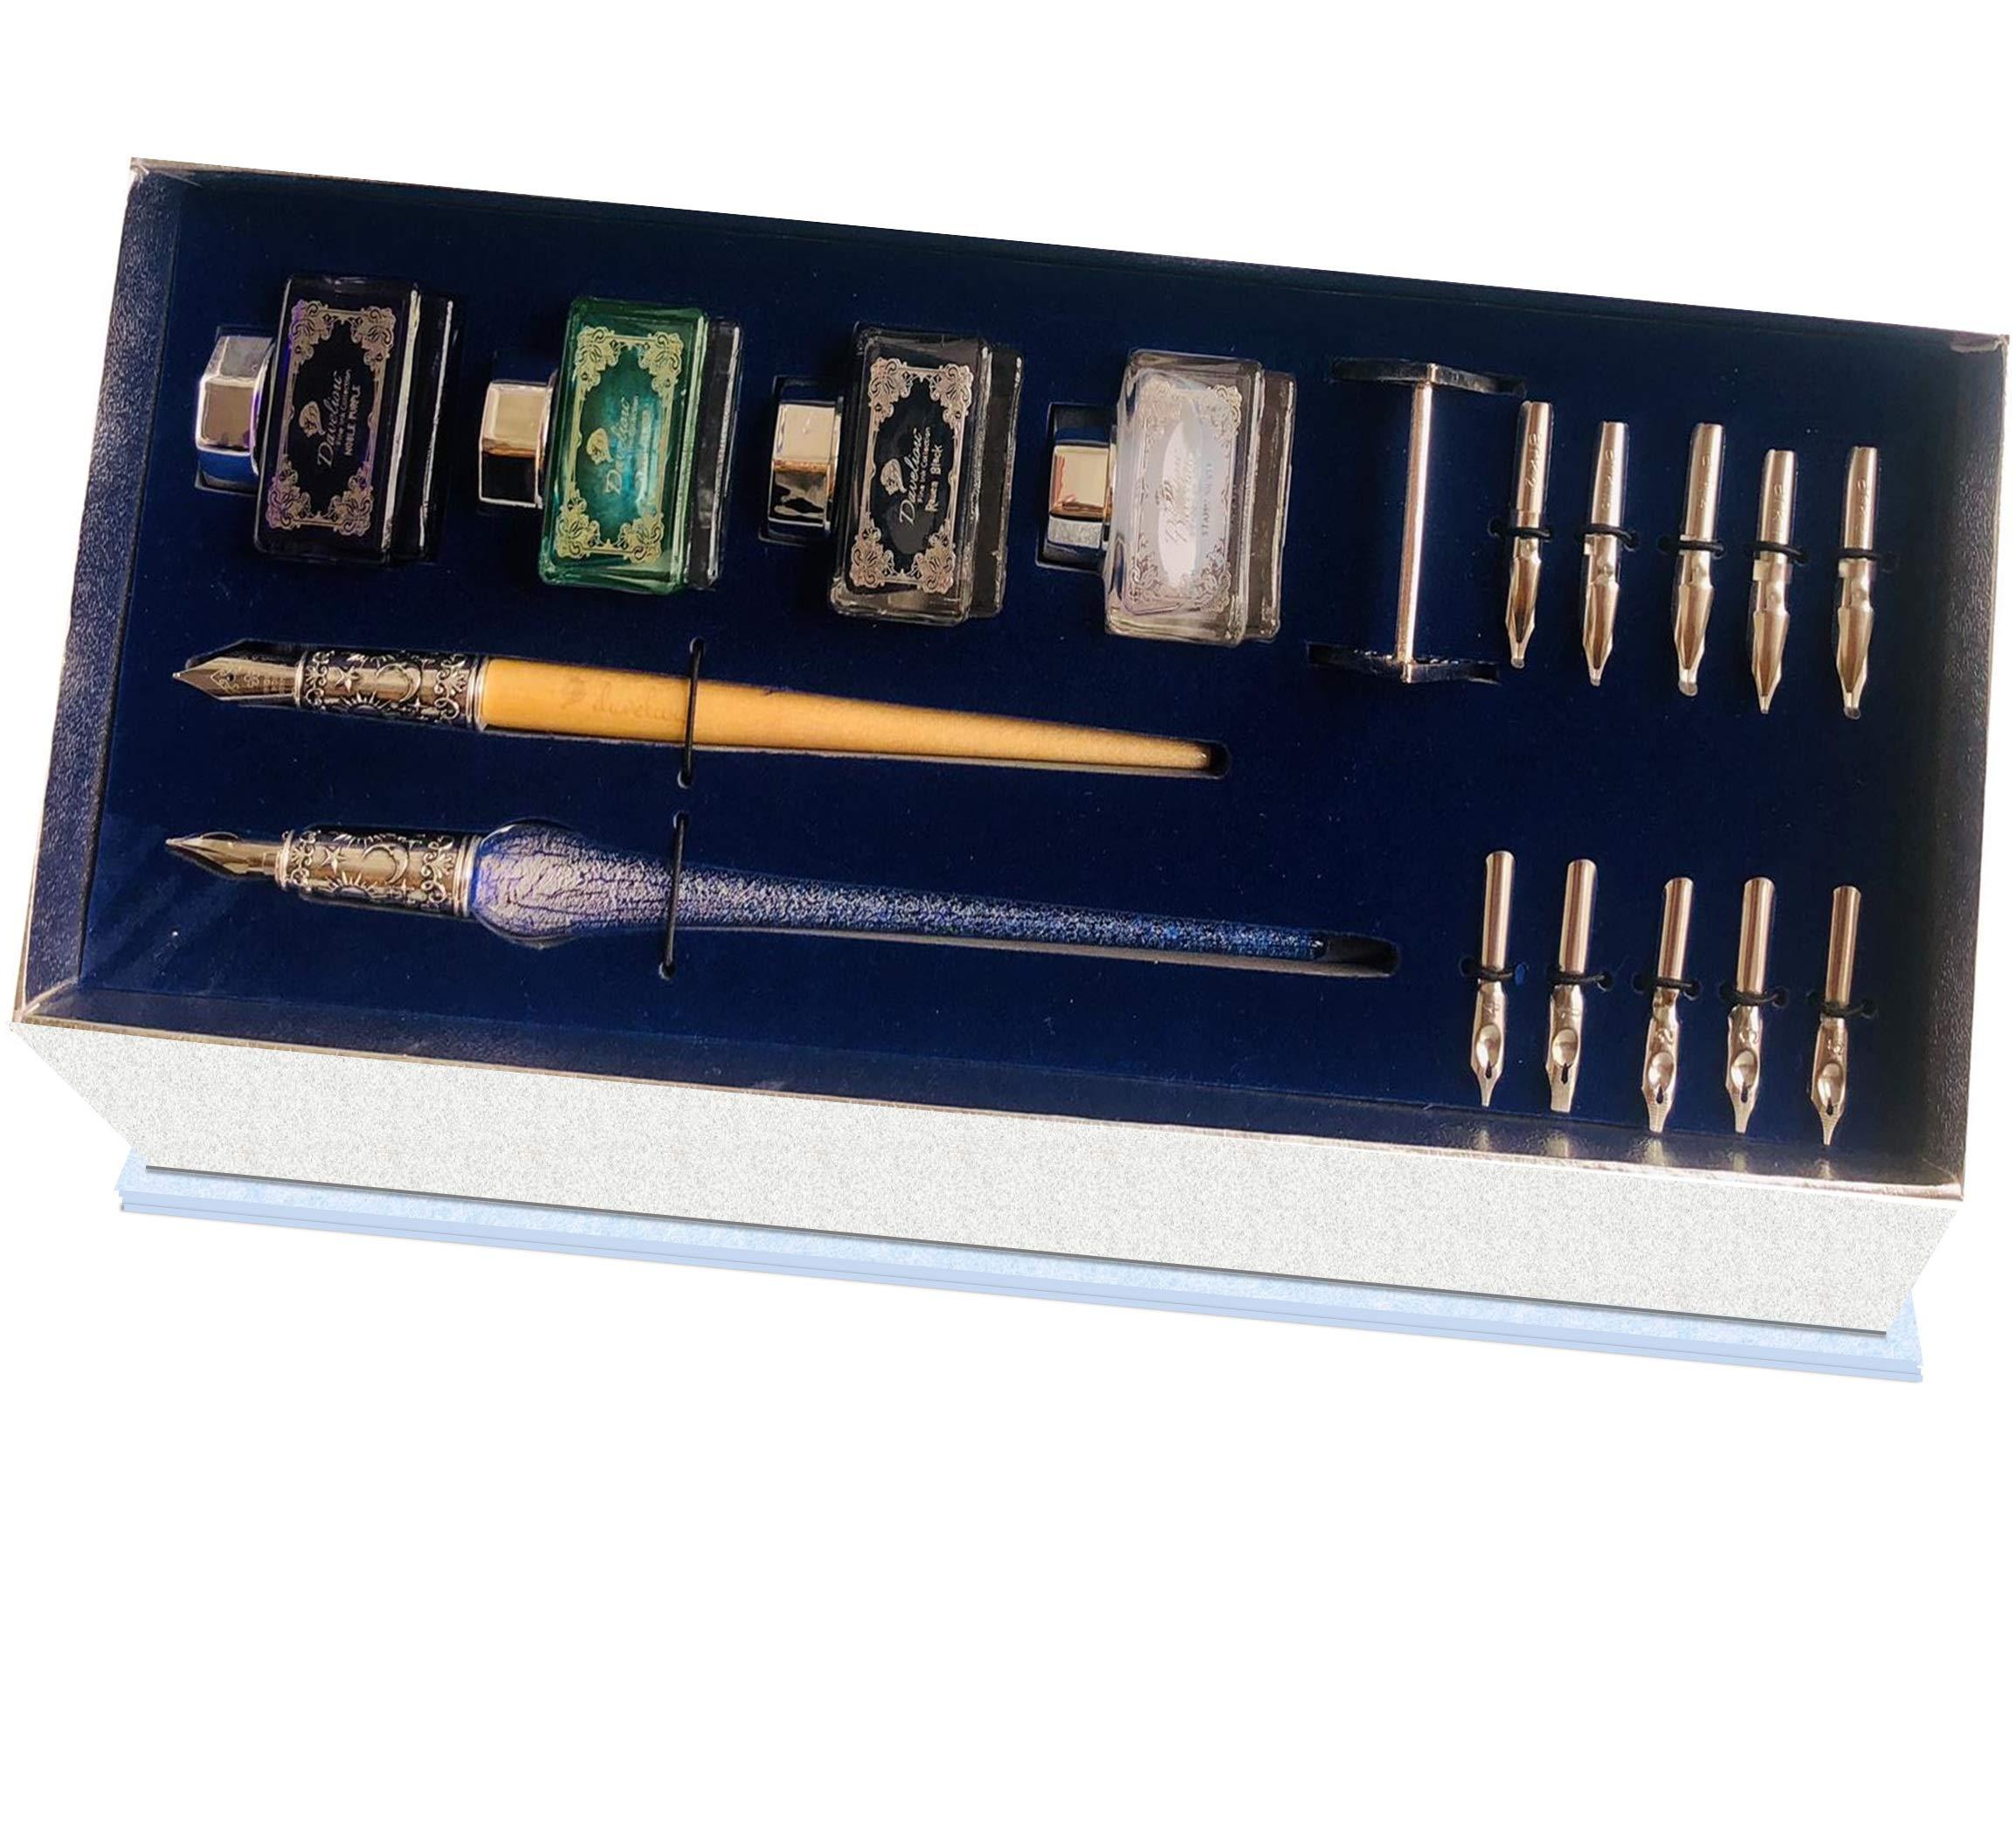 Daveliou Calligraphy Pen Set - 17-Piece Kit - Silver Leaf Blue Glass & Wooden Pens - 10 Nib & 4 Ink Set - Superior Control by Daveliou (Image #2)